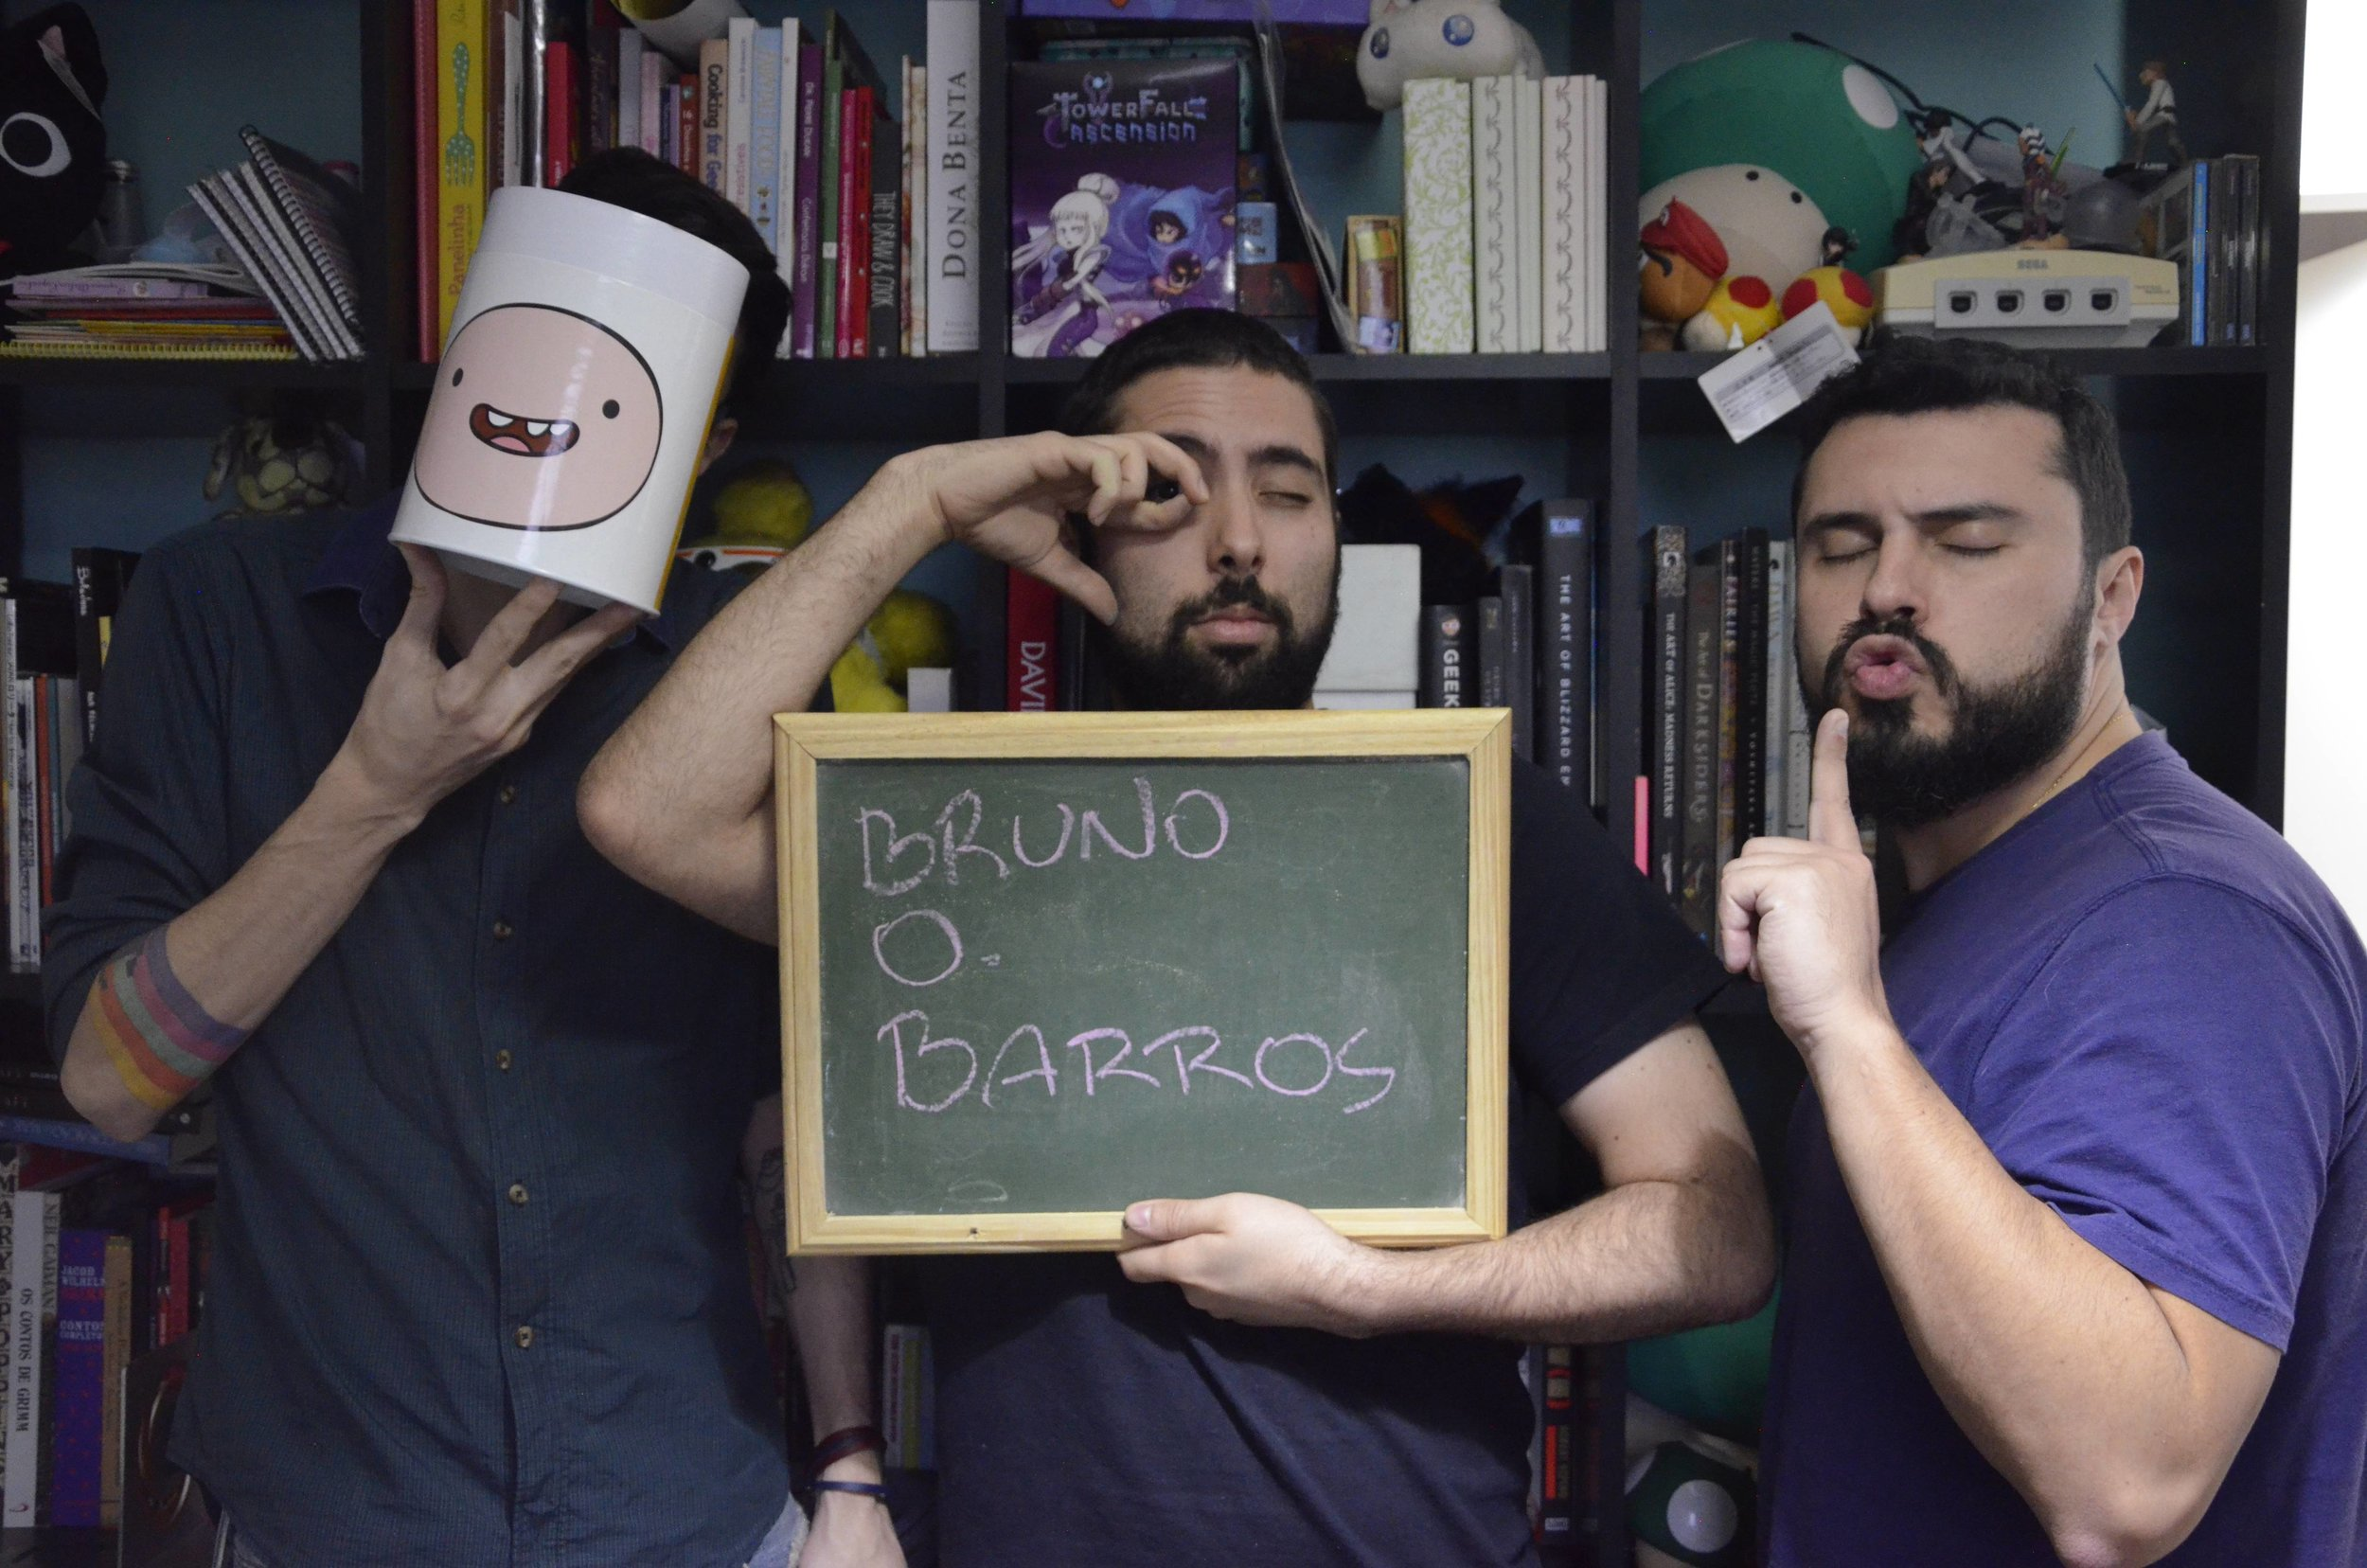 Bruno-O-Barros.jpg